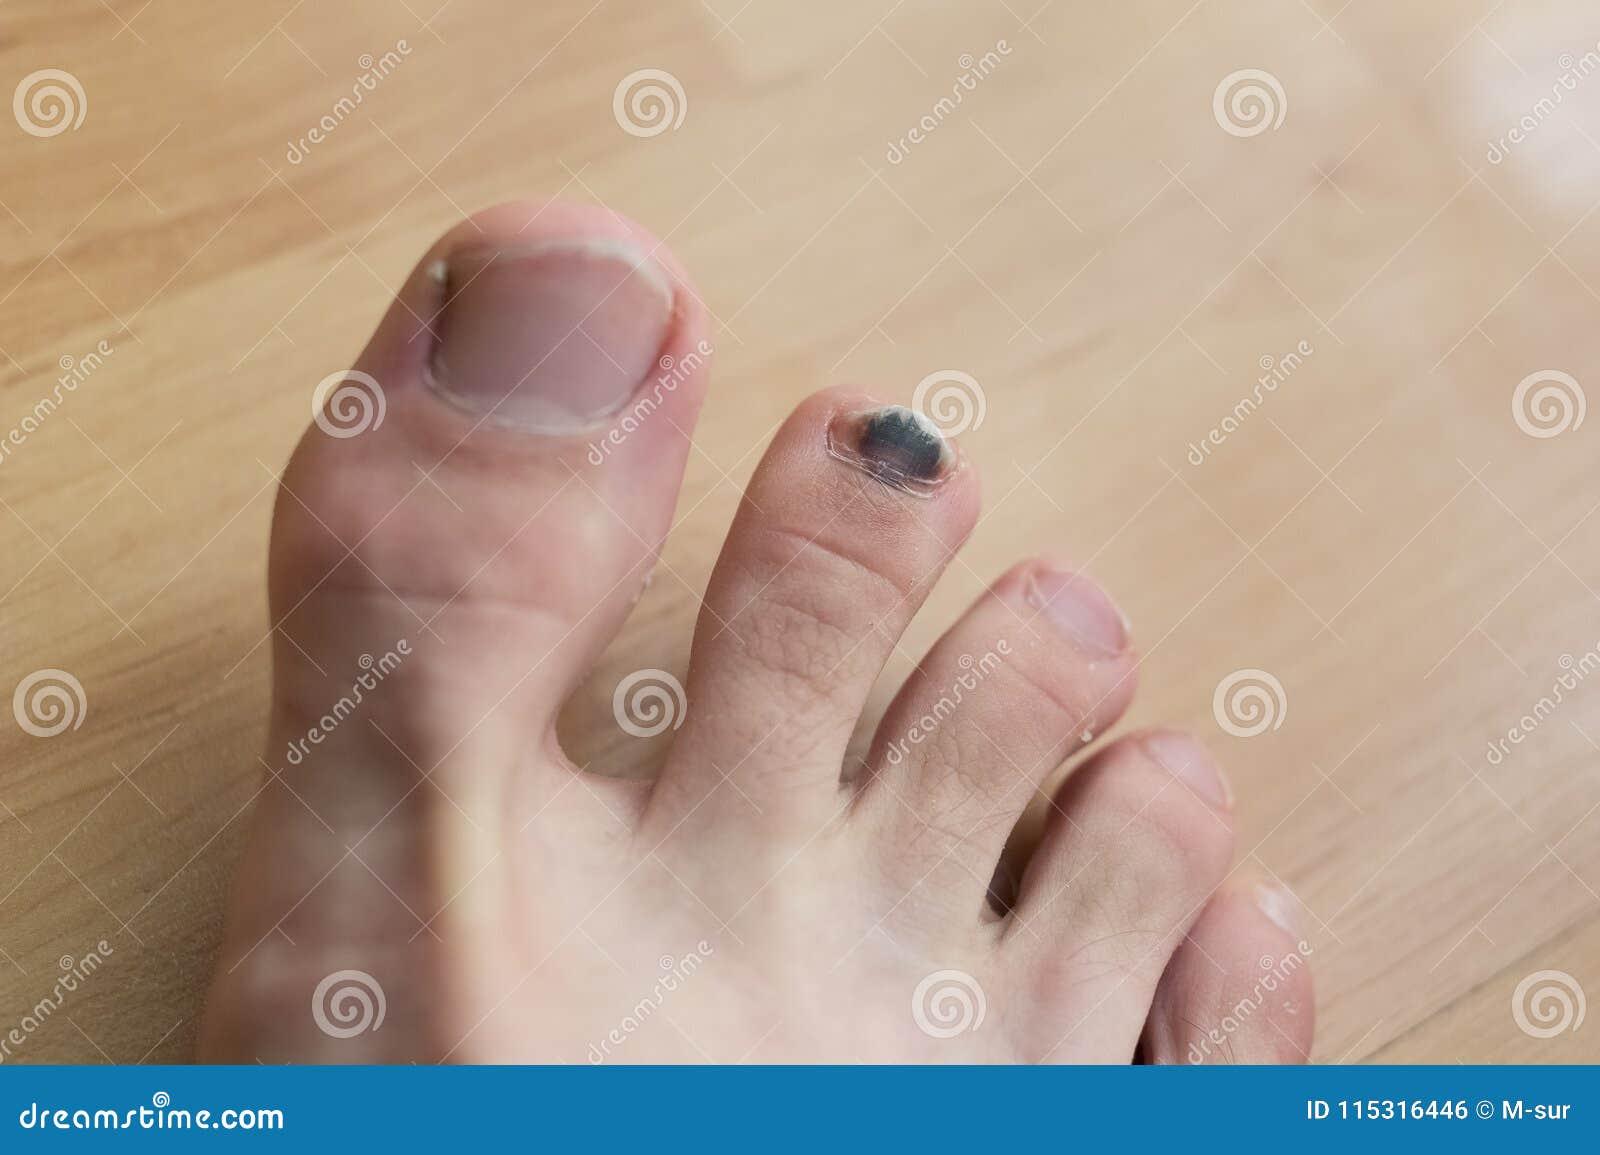 Black toenail after injury stock photo. Image of finger - 115316446